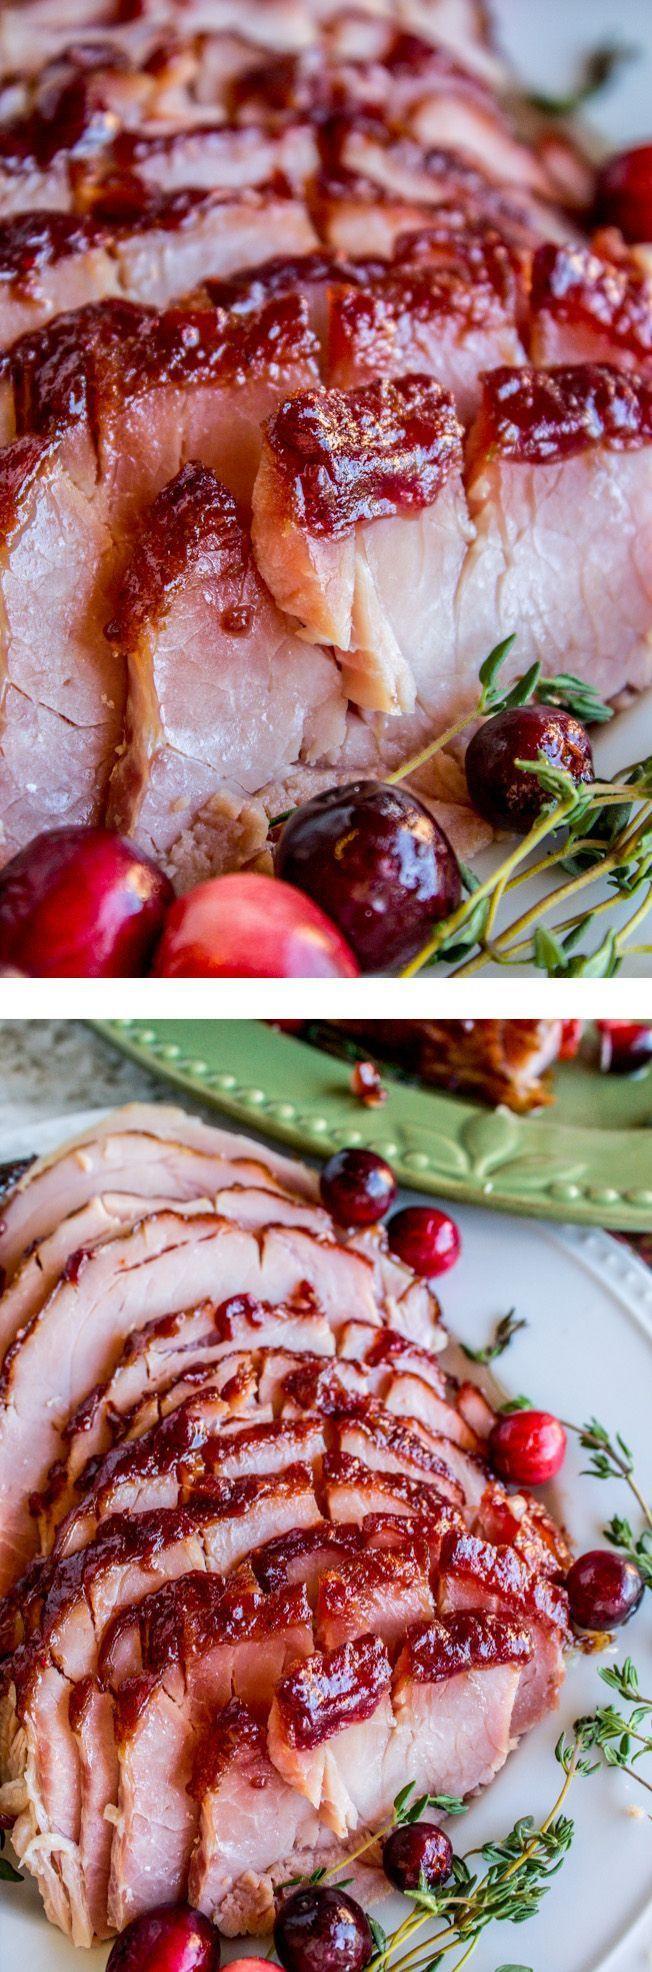 Thanksgiving Ham Glaze Recipes  100 Baked Ham Recipes on Pinterest